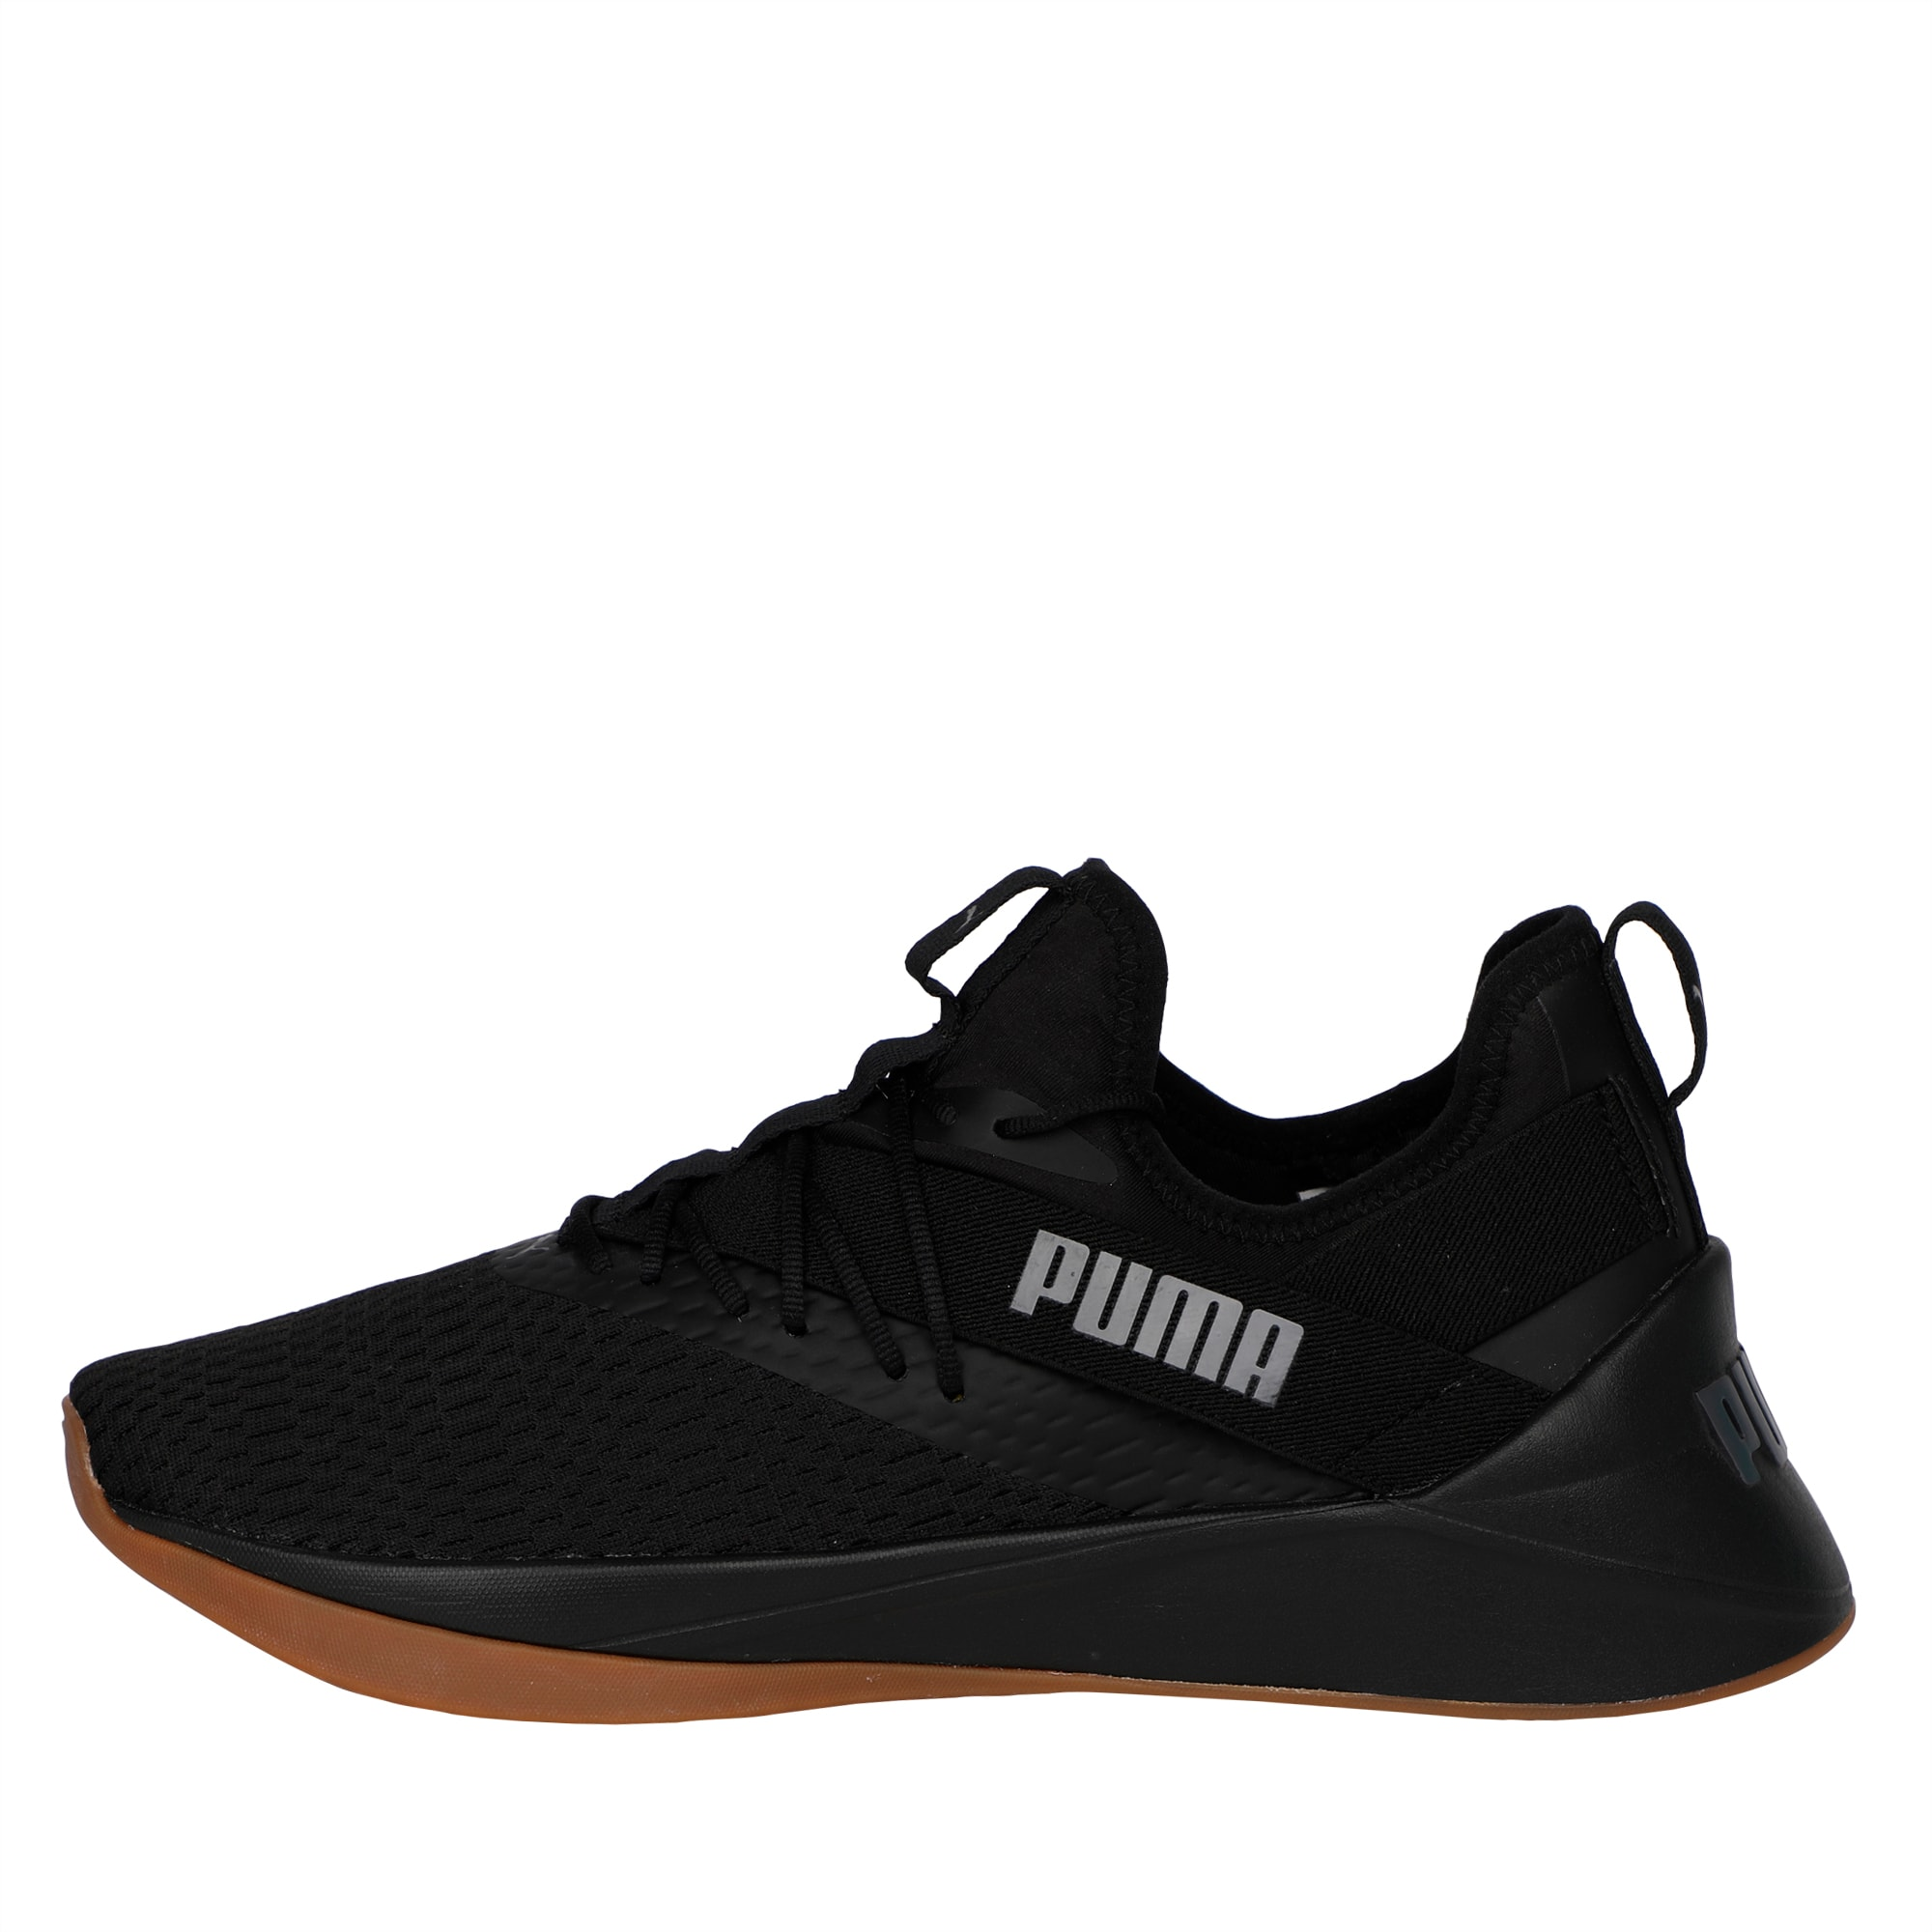 complemento Indulgente Humano  Jaab XT Summer Men's Trainers   PUMA Shoes   PUMA